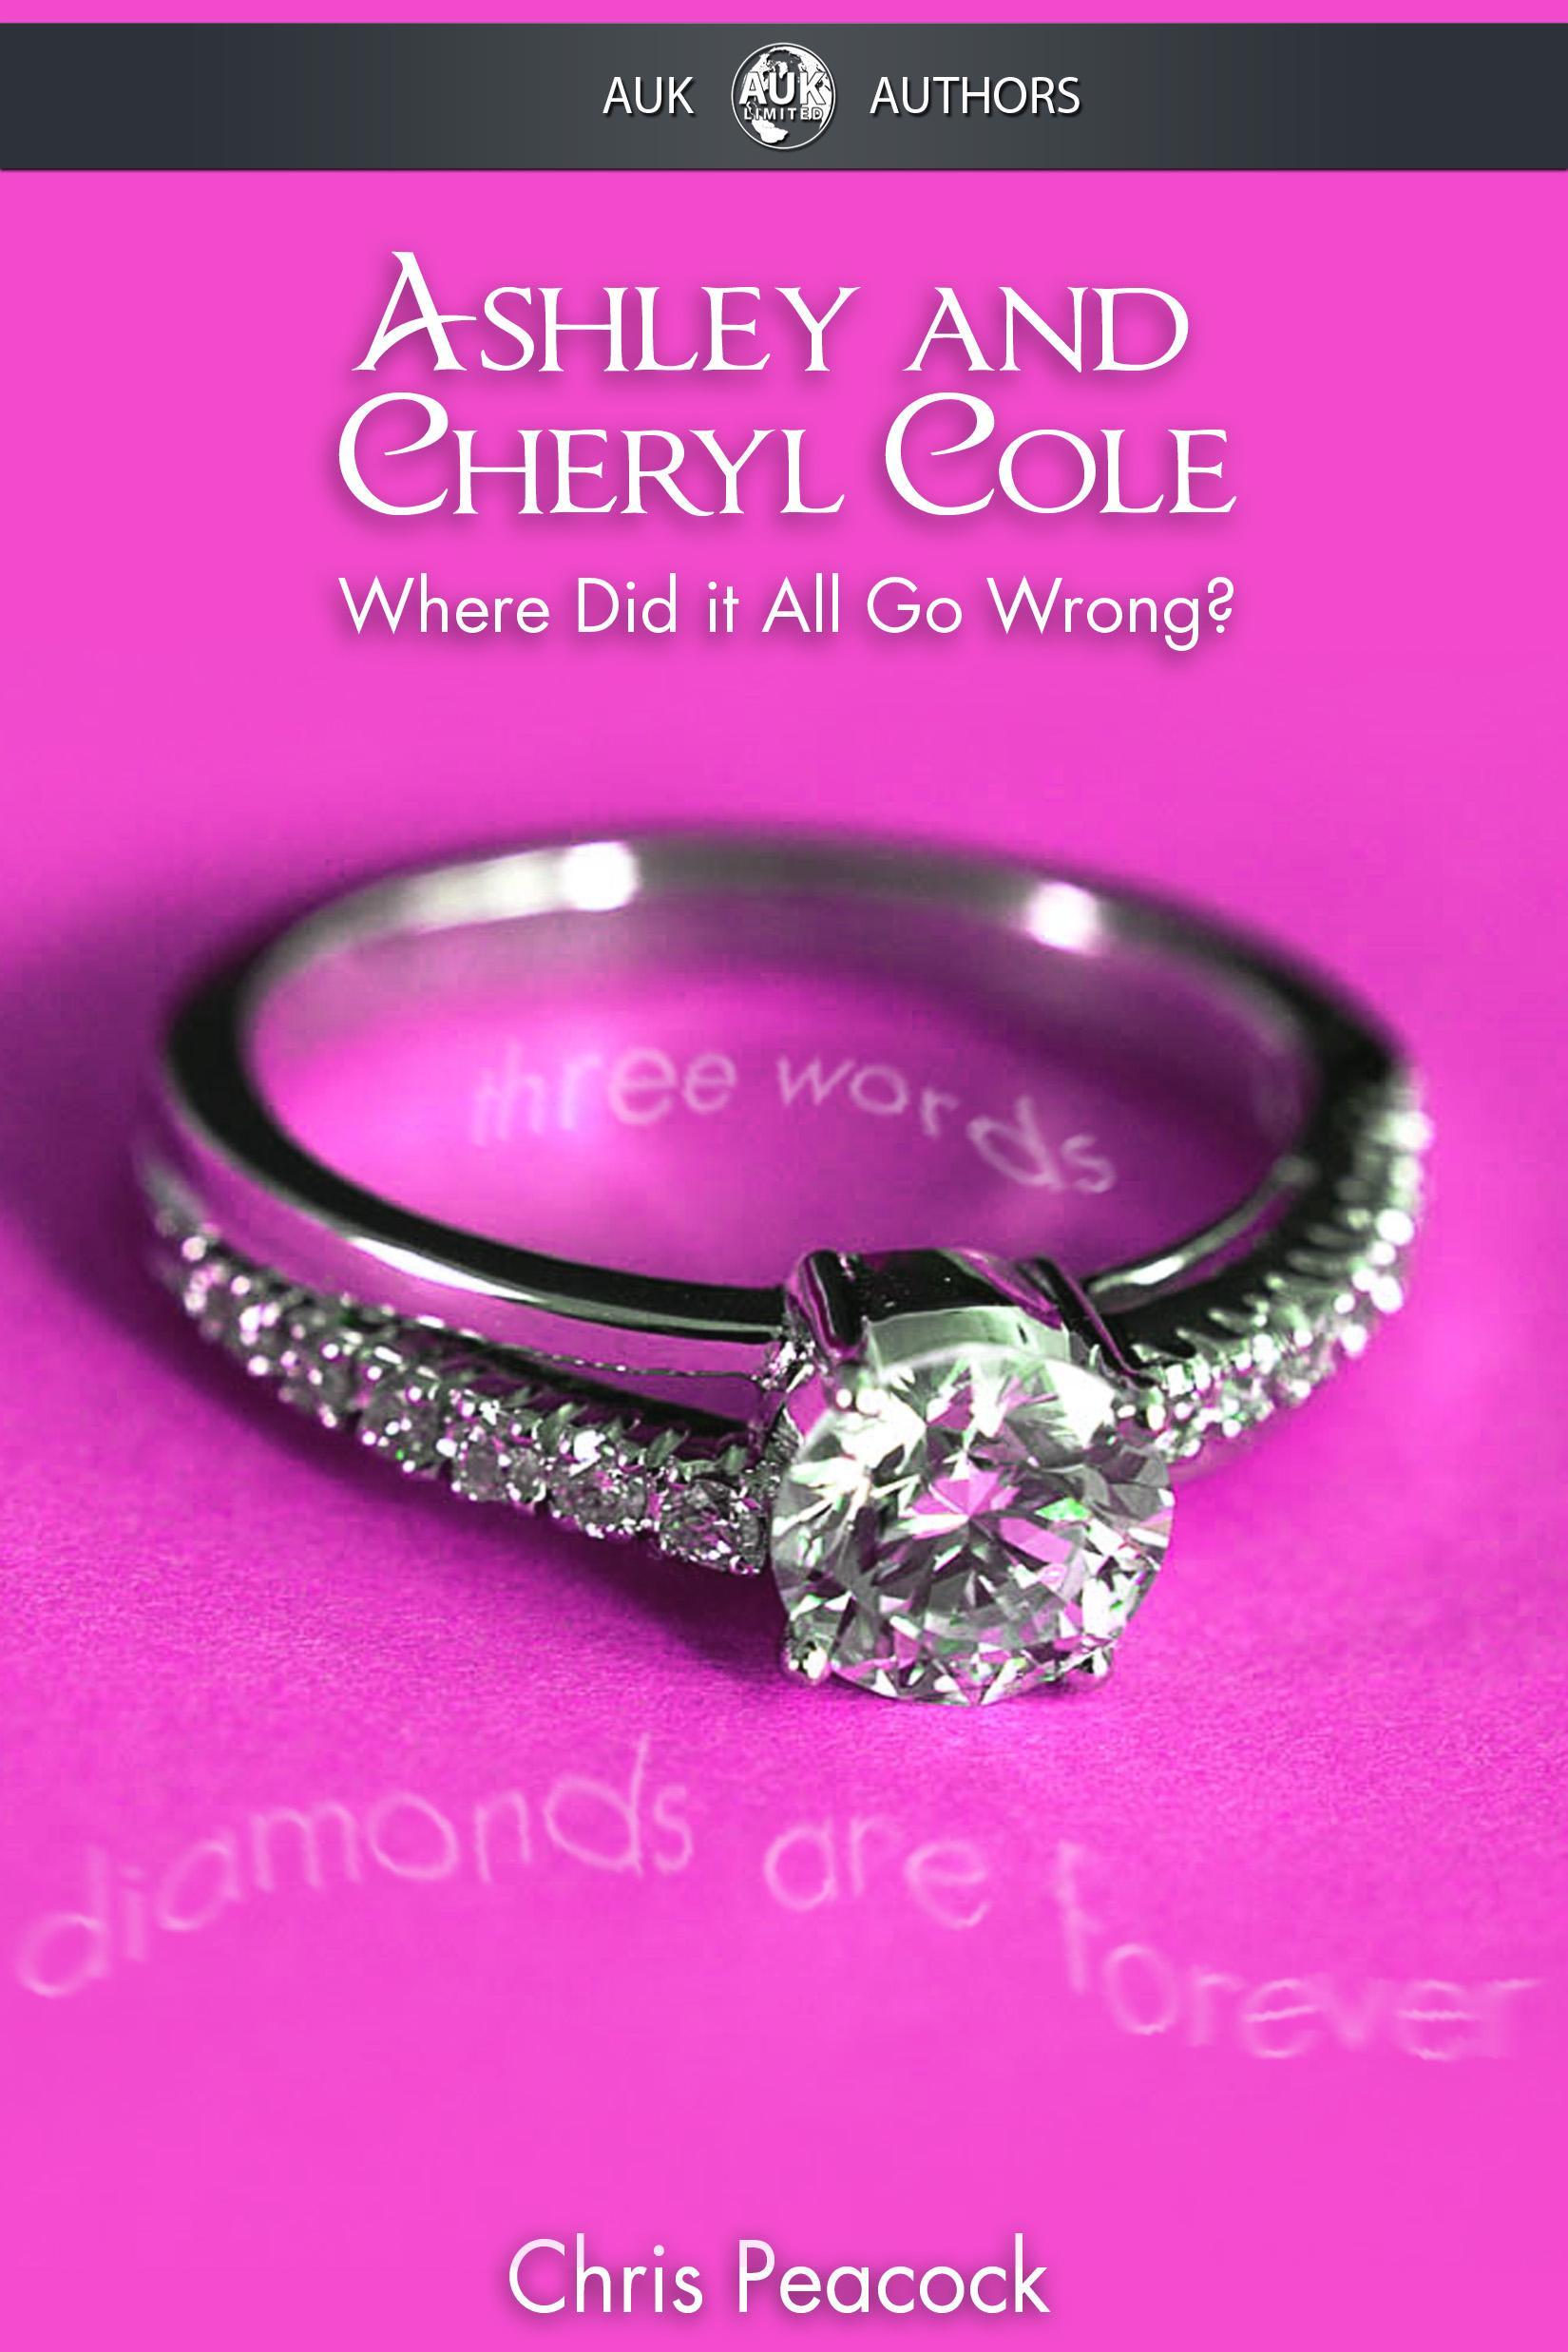 Ashley & Cheryl Cole: Where Did It All Go Wrong? EB2370002780896